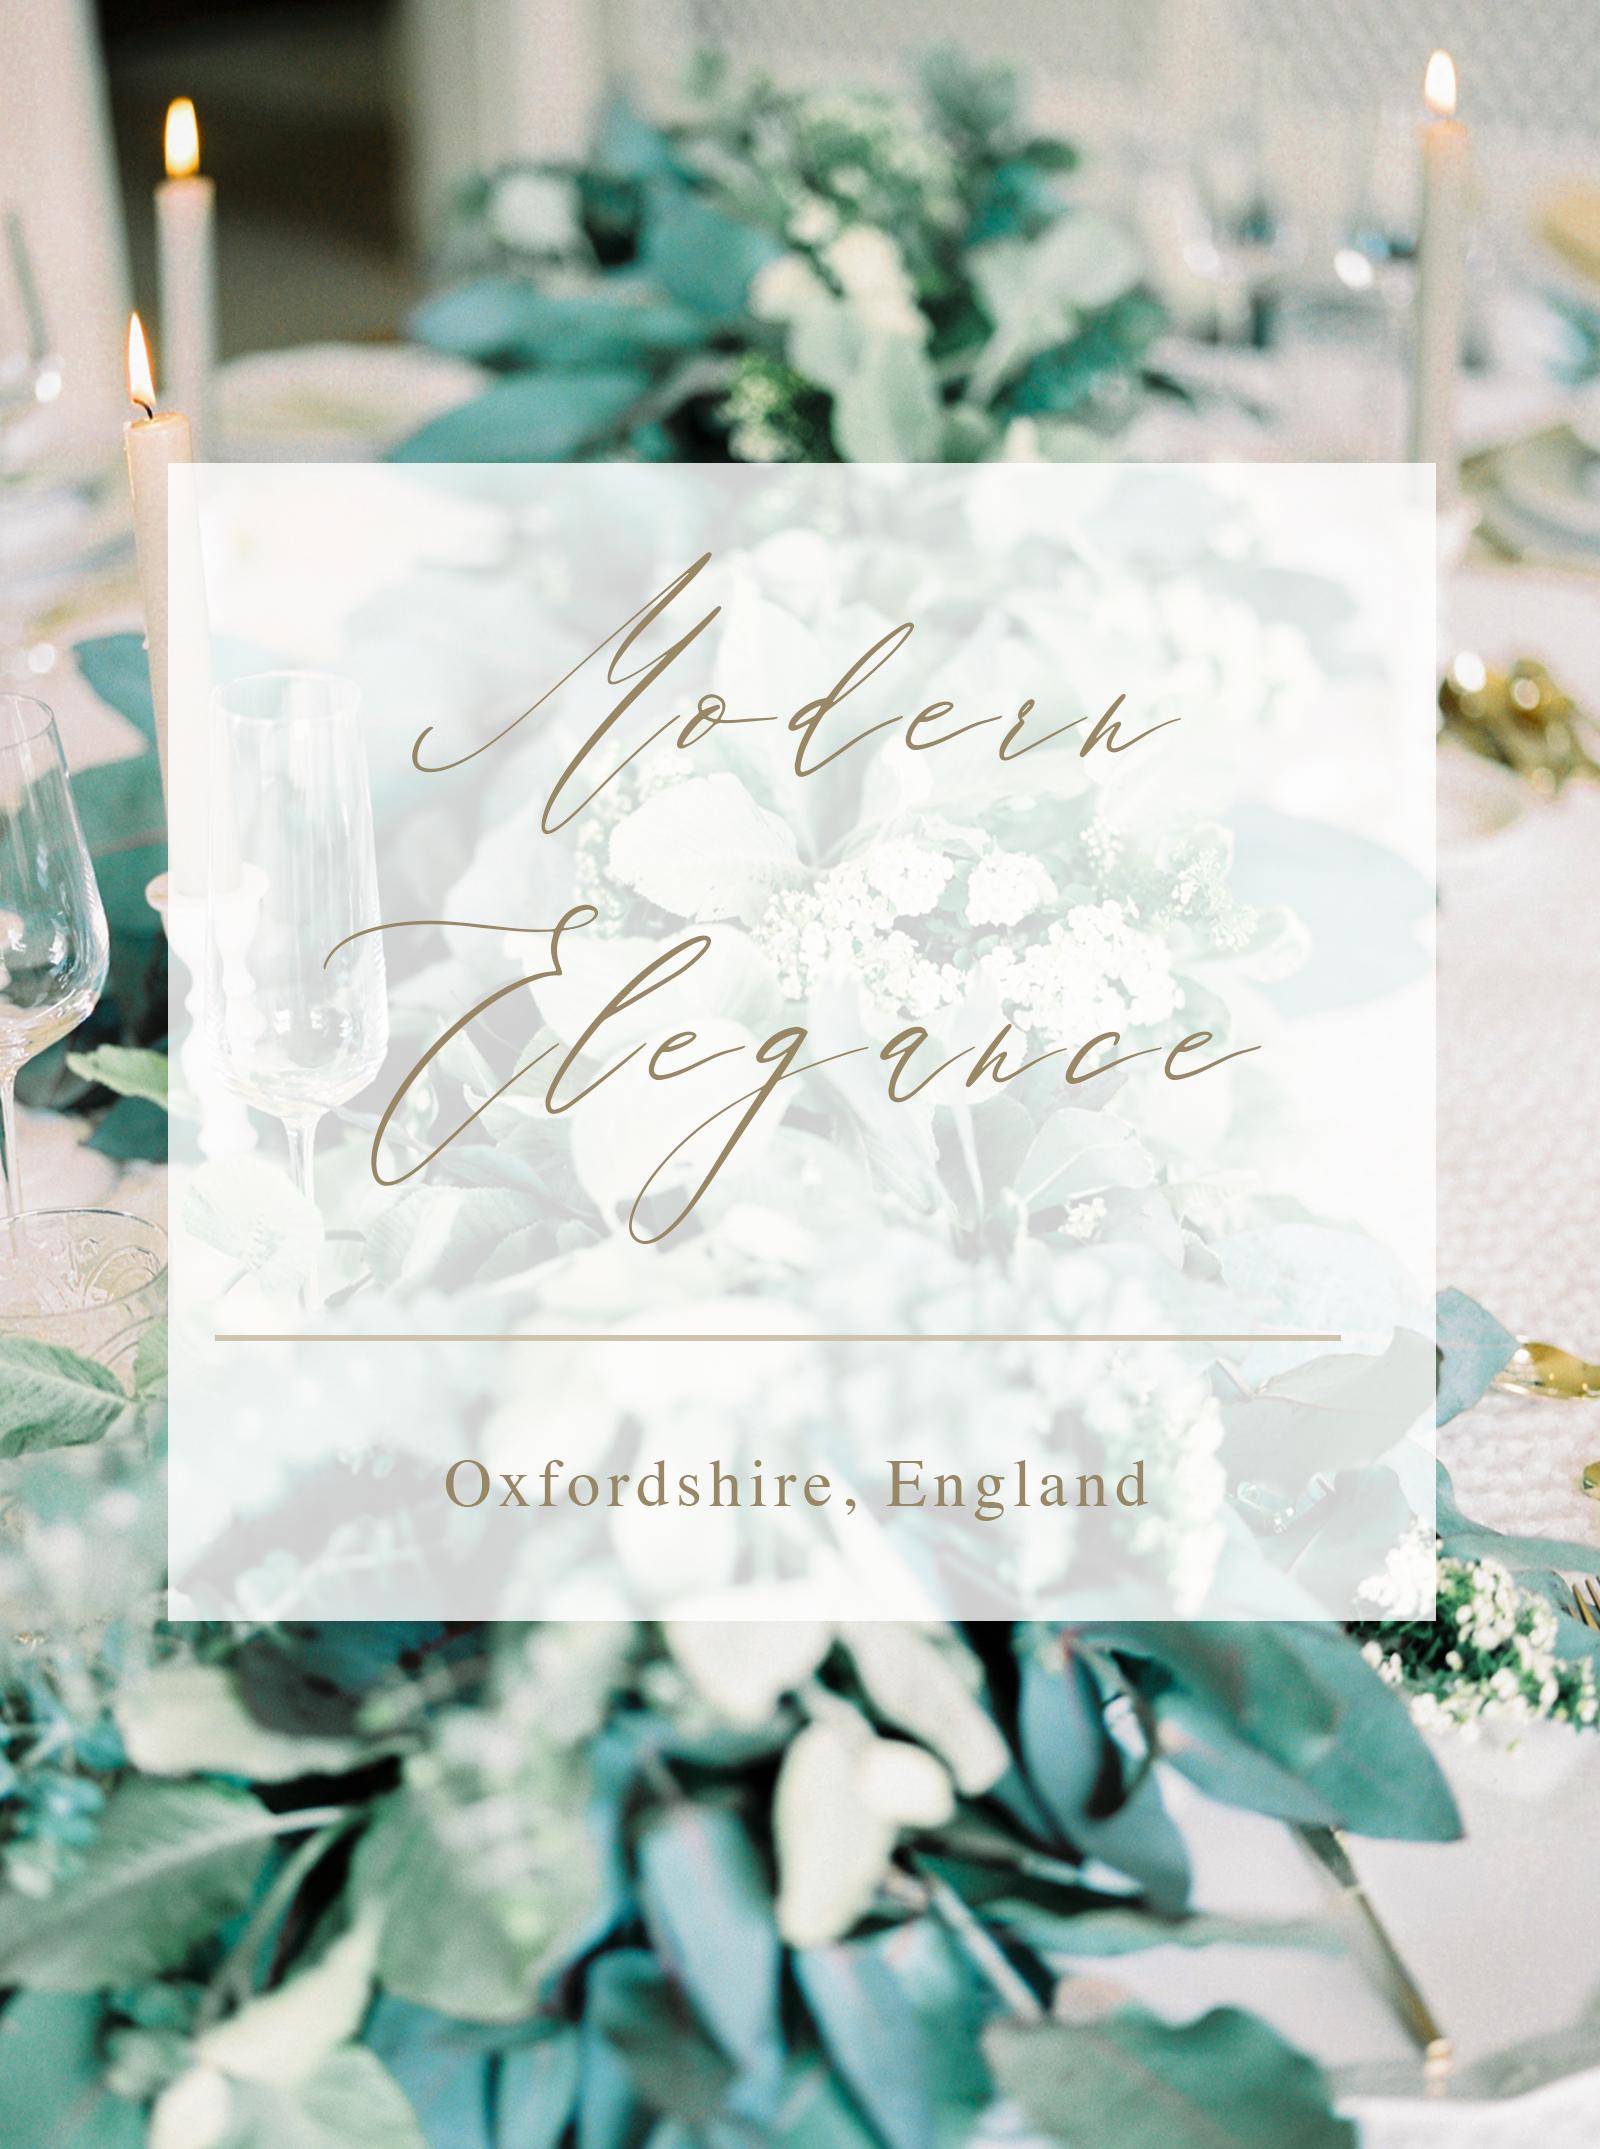 Luxury+Wedding+Planner+UK+_+A+Serene+&+Feminine+English+Country+House+Wedding+_+White+and+Silver+Toned+Green+Neutral+Tones+Rutland+_+Katie+Julia+Photography+Serene+Femininity+Image+4.png